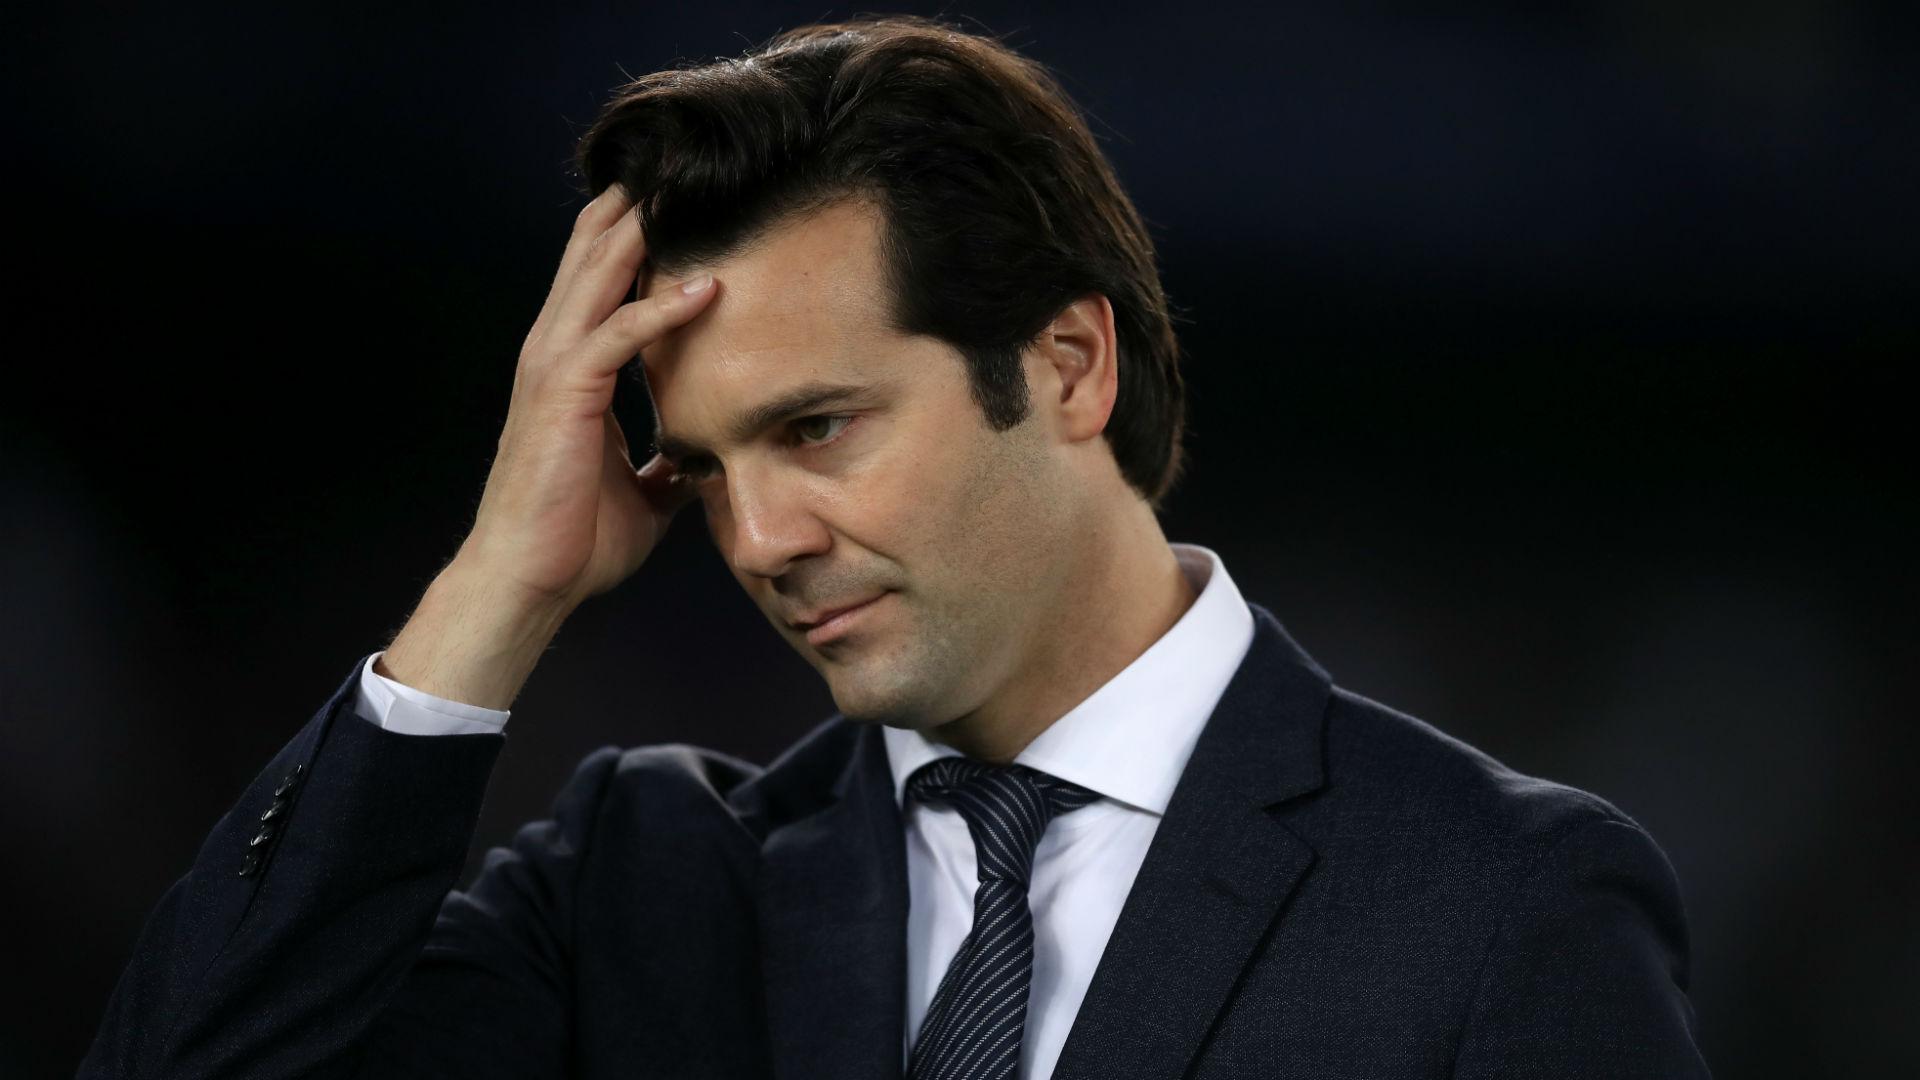 Solari is good, just like Zidane and Mourinho – Valverde